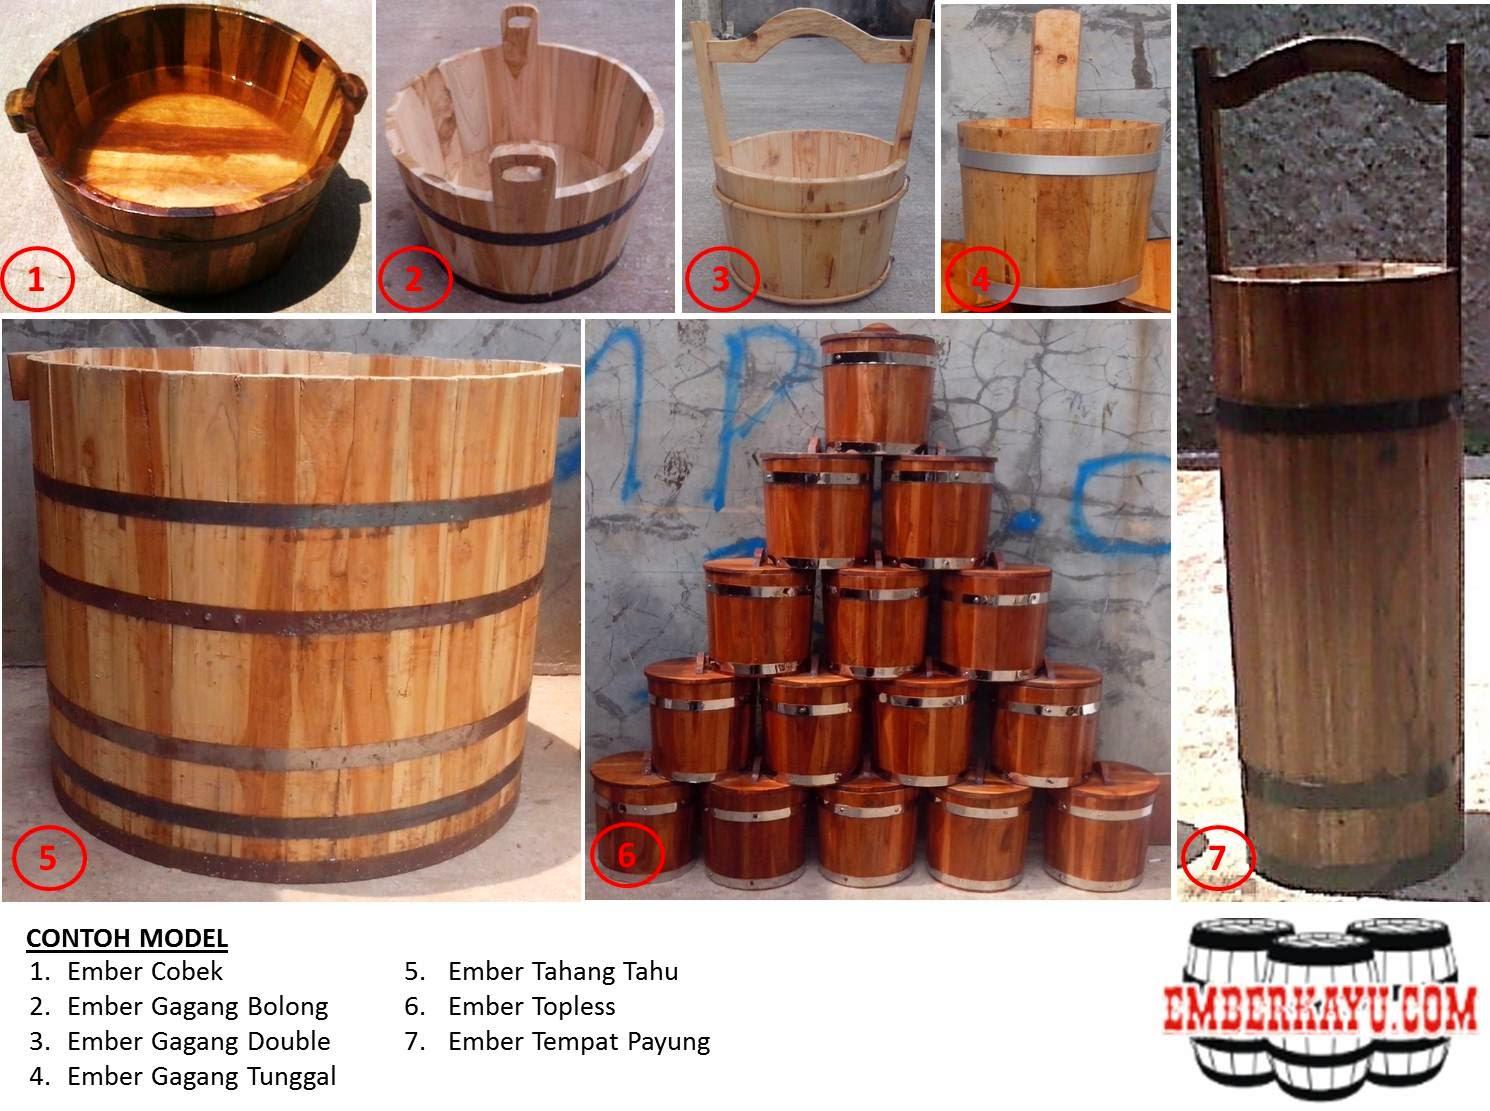 ember kayu, bak kayu, ember kayu jati, ember kayu jakarta, bak kayu, ember dari kayu, ember kayu rendaman kaki, ember kayu refleksi, tempat payung dari kayu